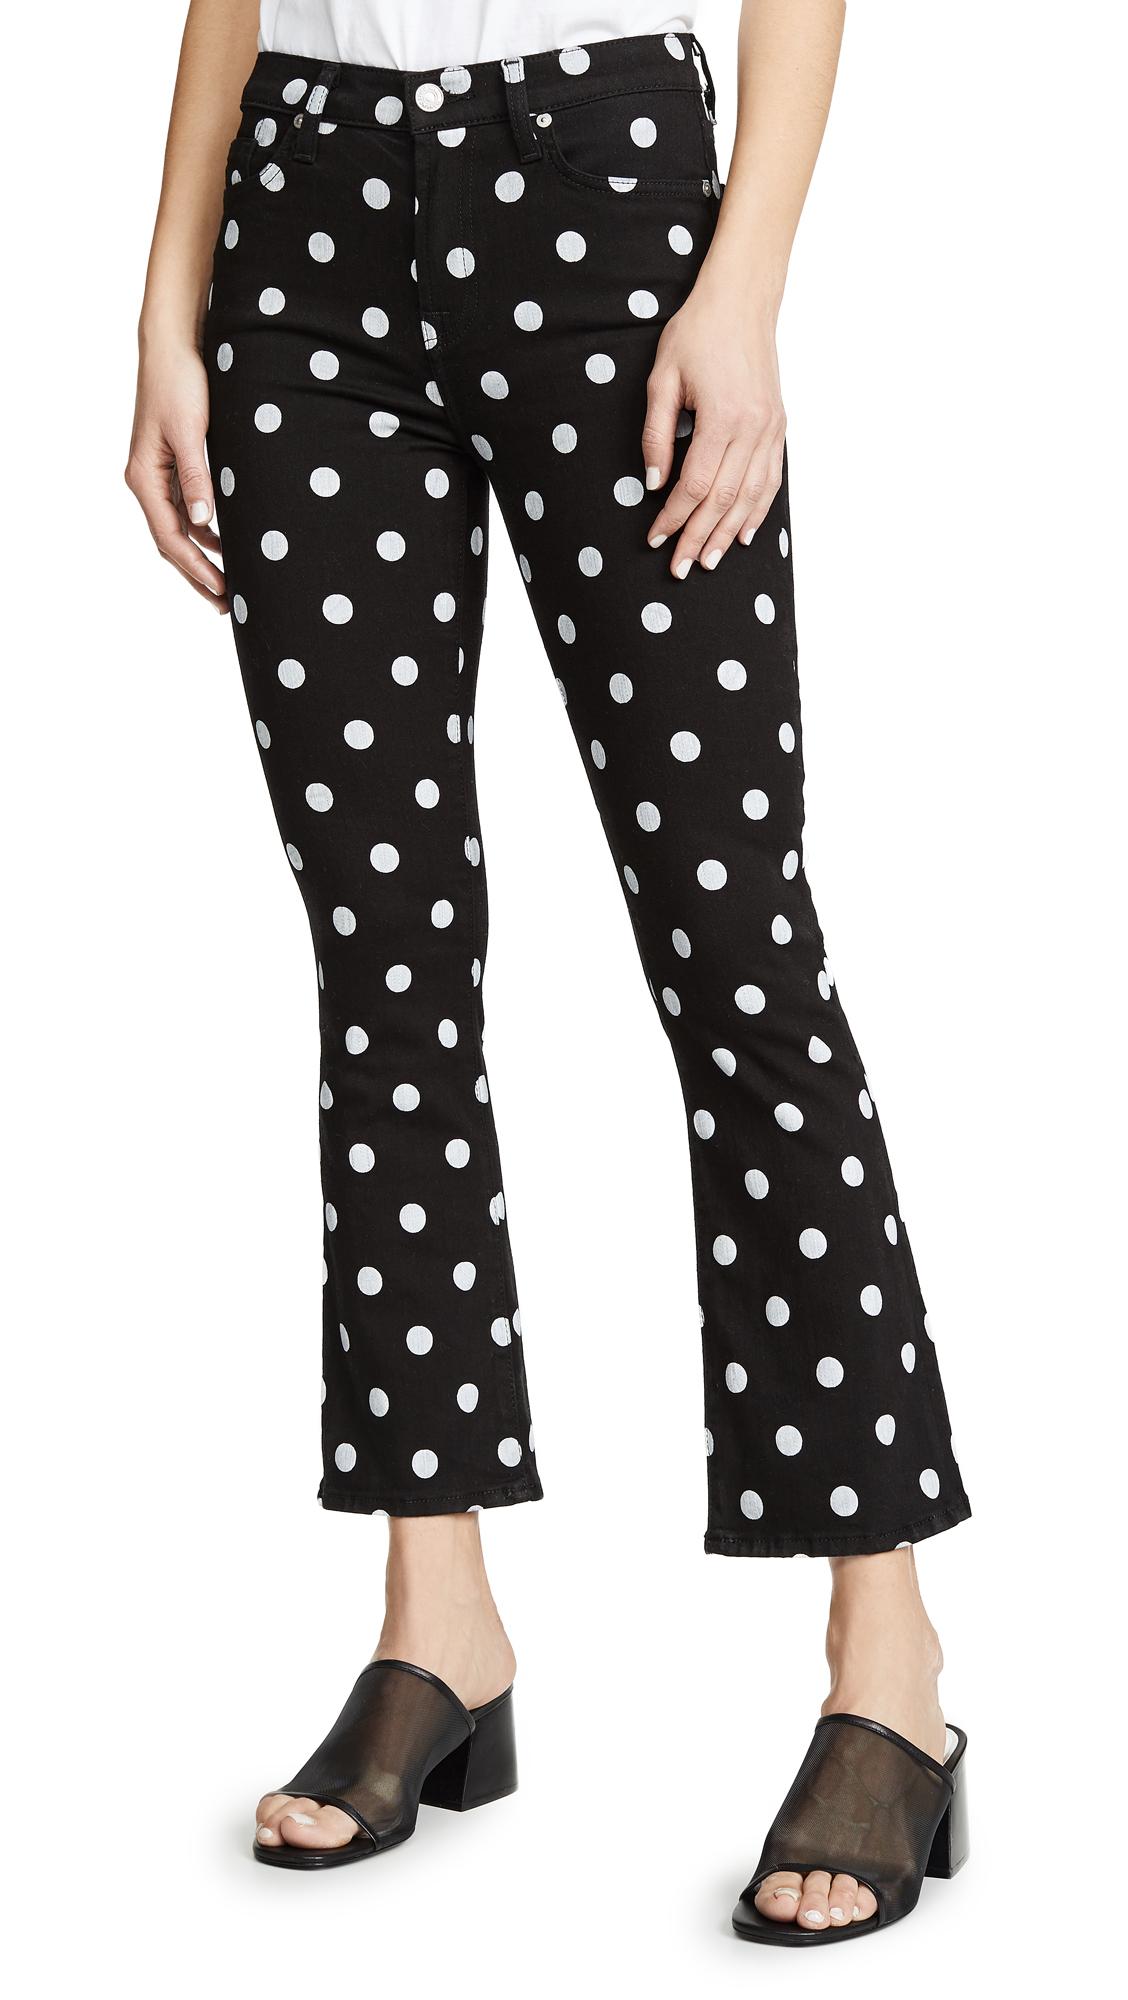 7 For All Mankind High Waist Slim Kick Jeans - Black/White Polka Dots